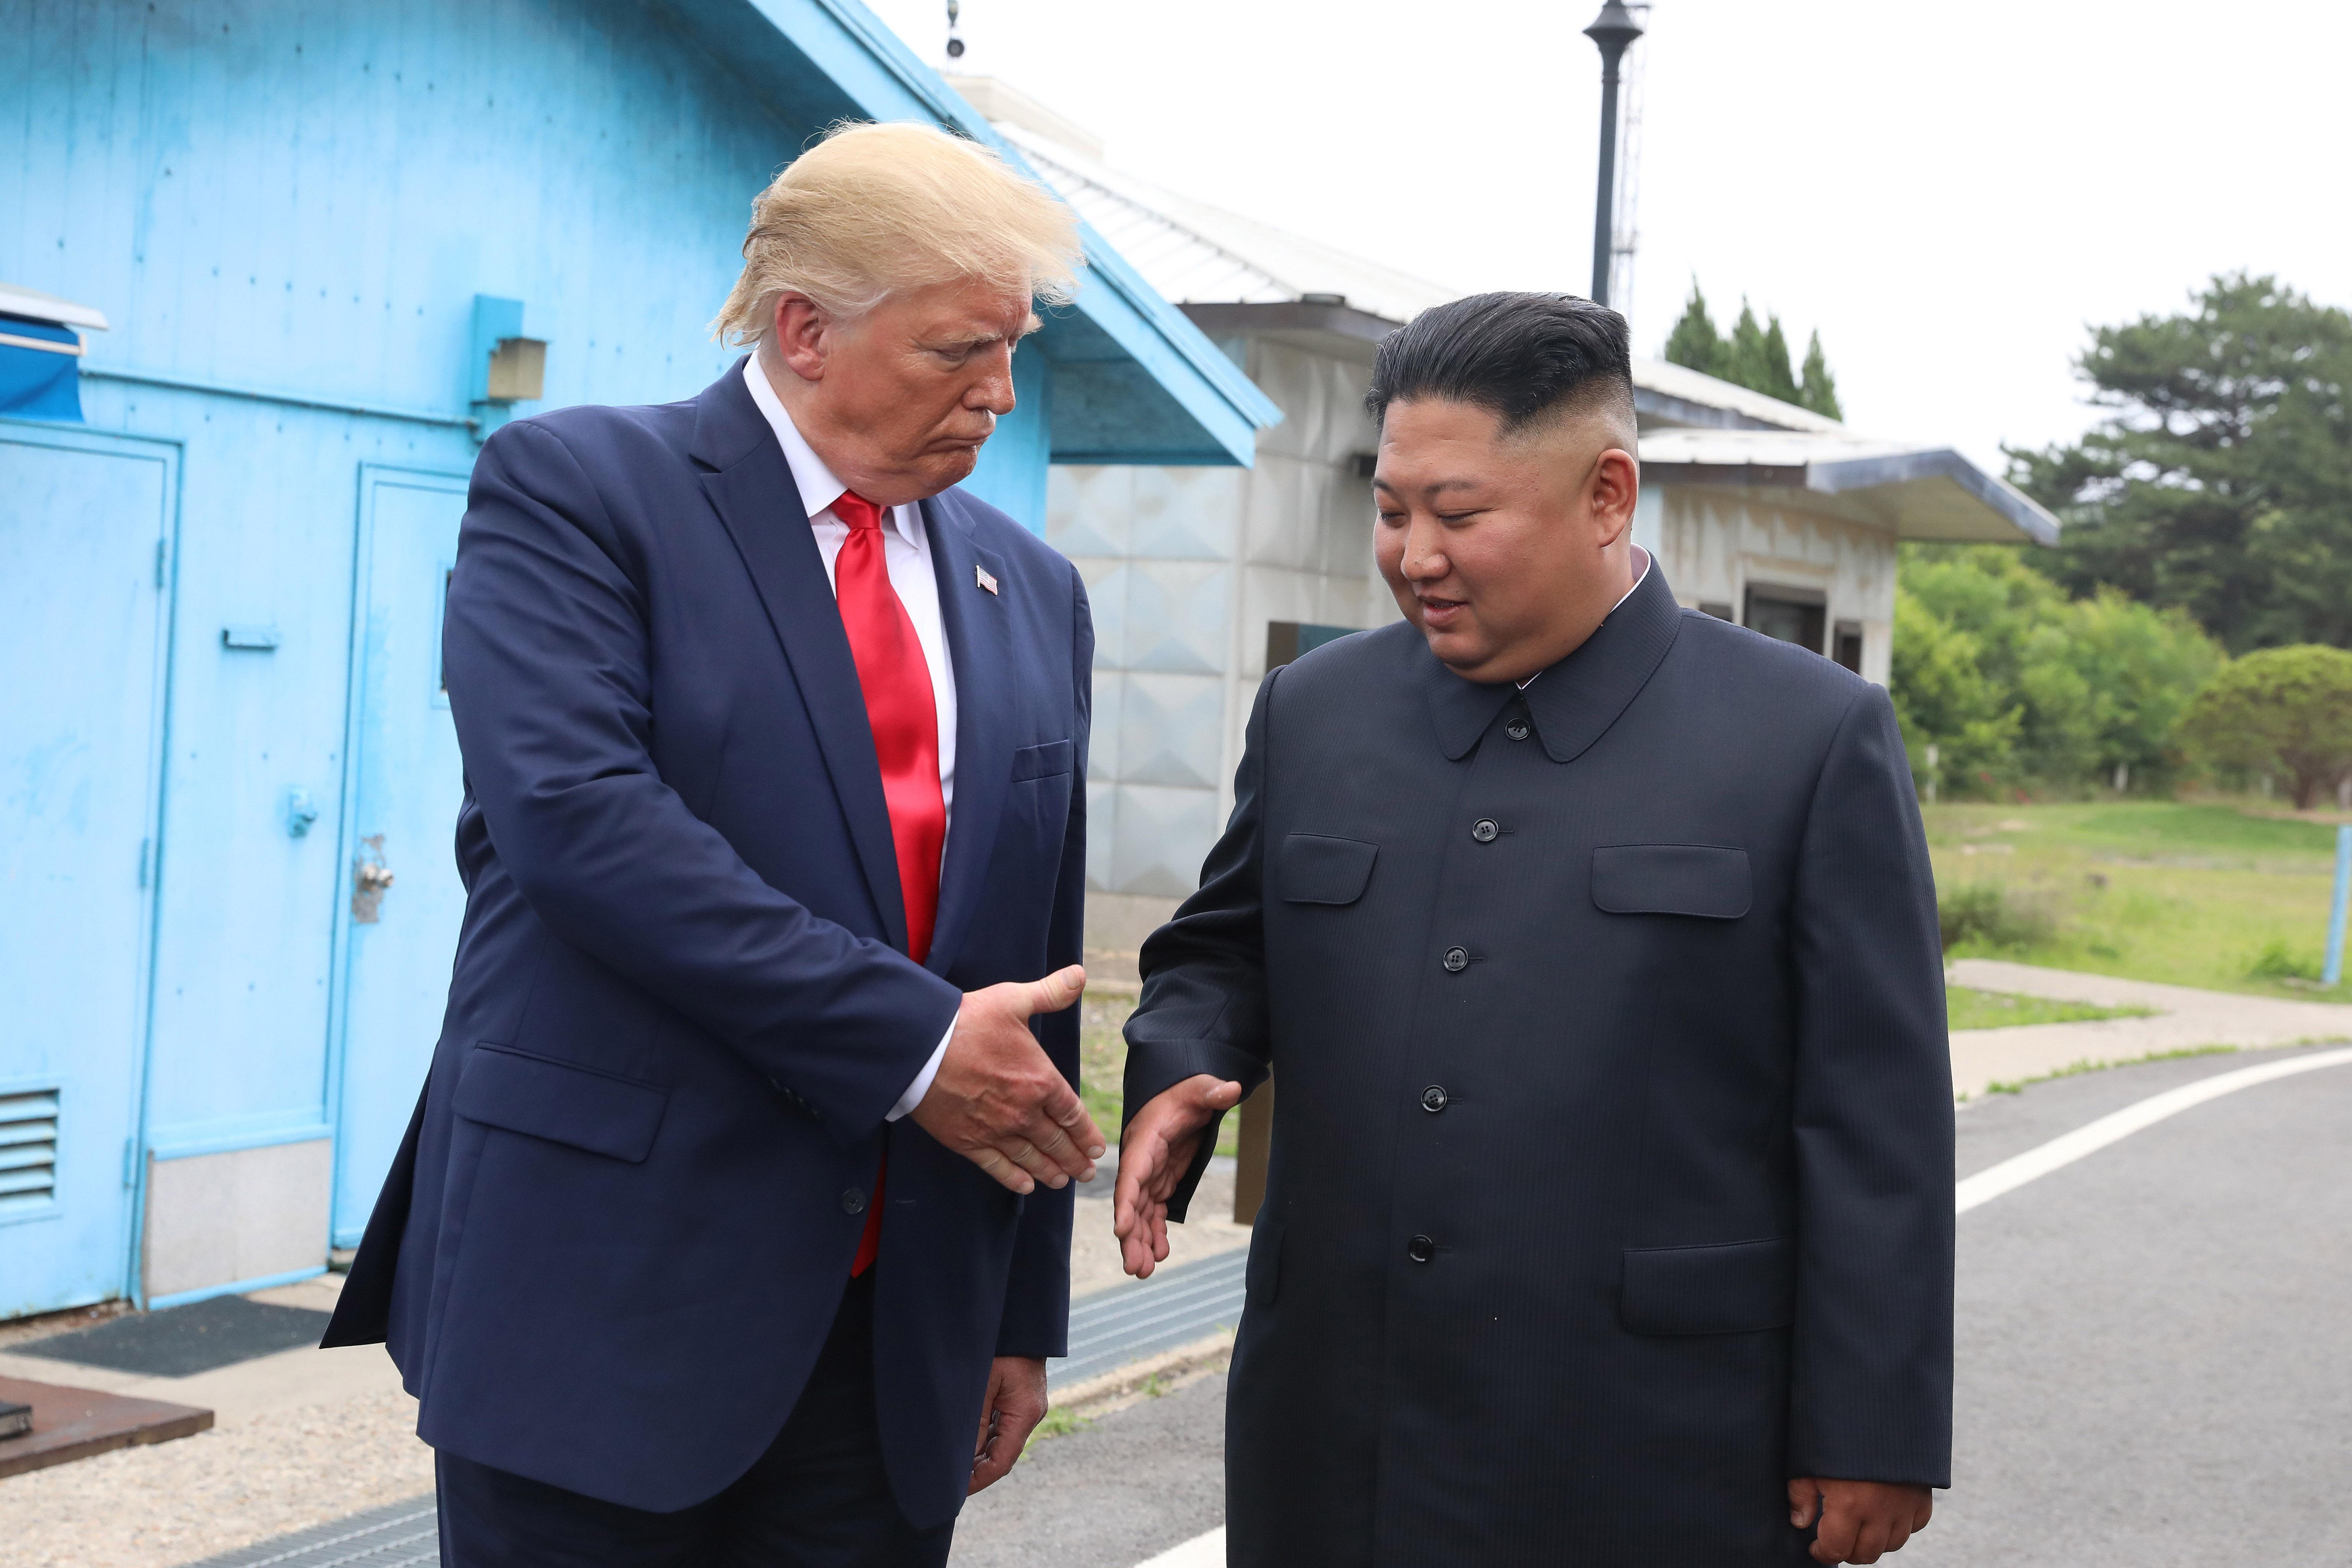 President Trump and Kim Jong Un starting to shake hands.